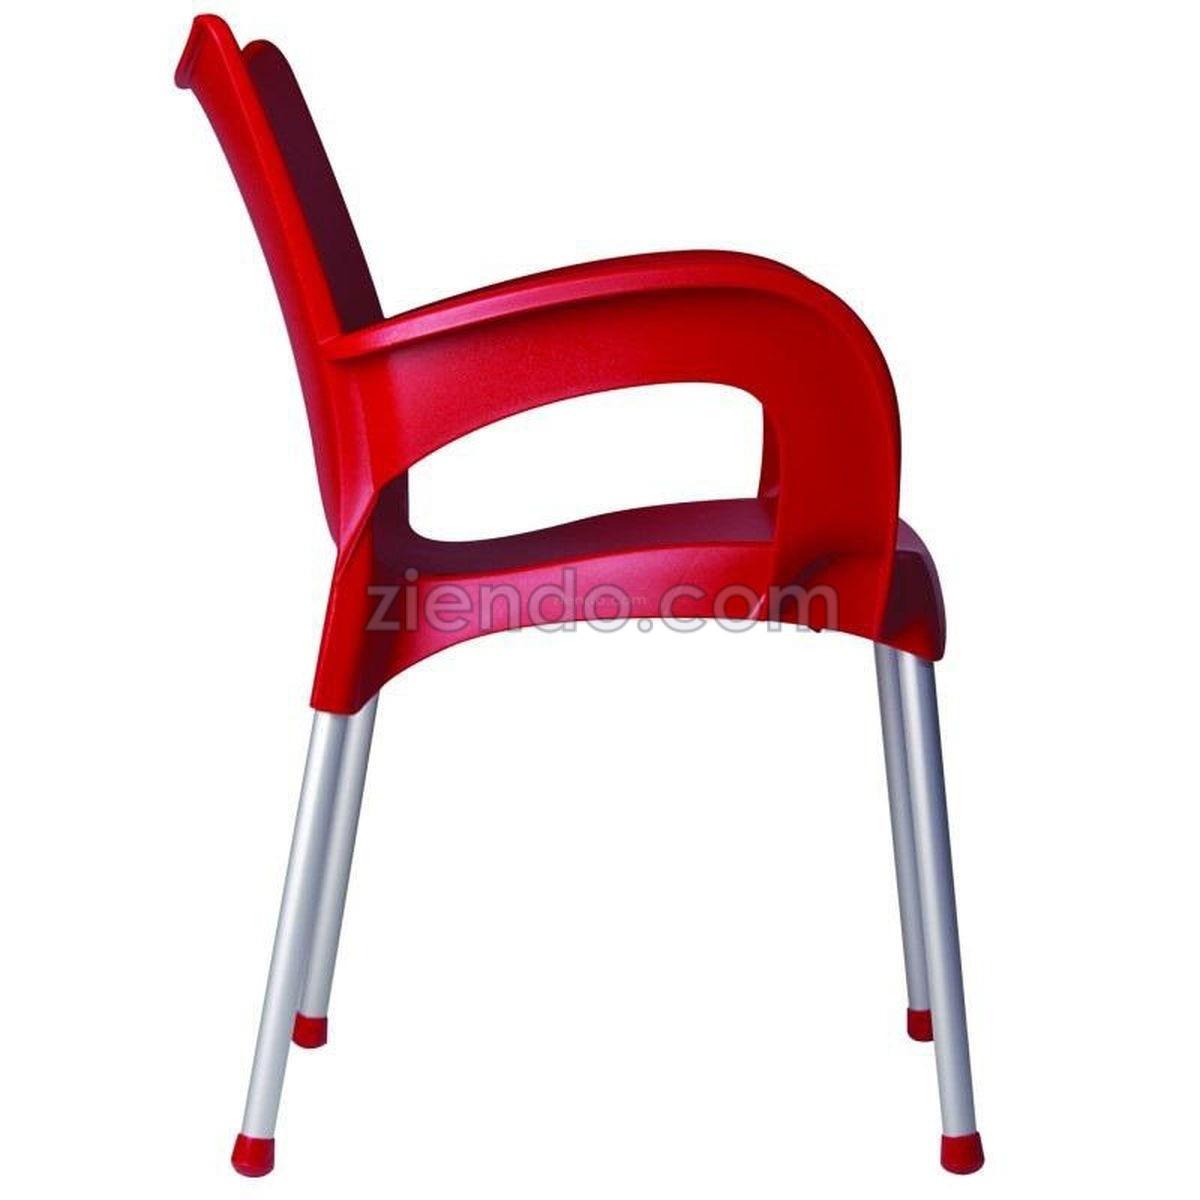 plastic resin chairs yugoslavian folding chair outdoor multipurpose arm red ziendo online